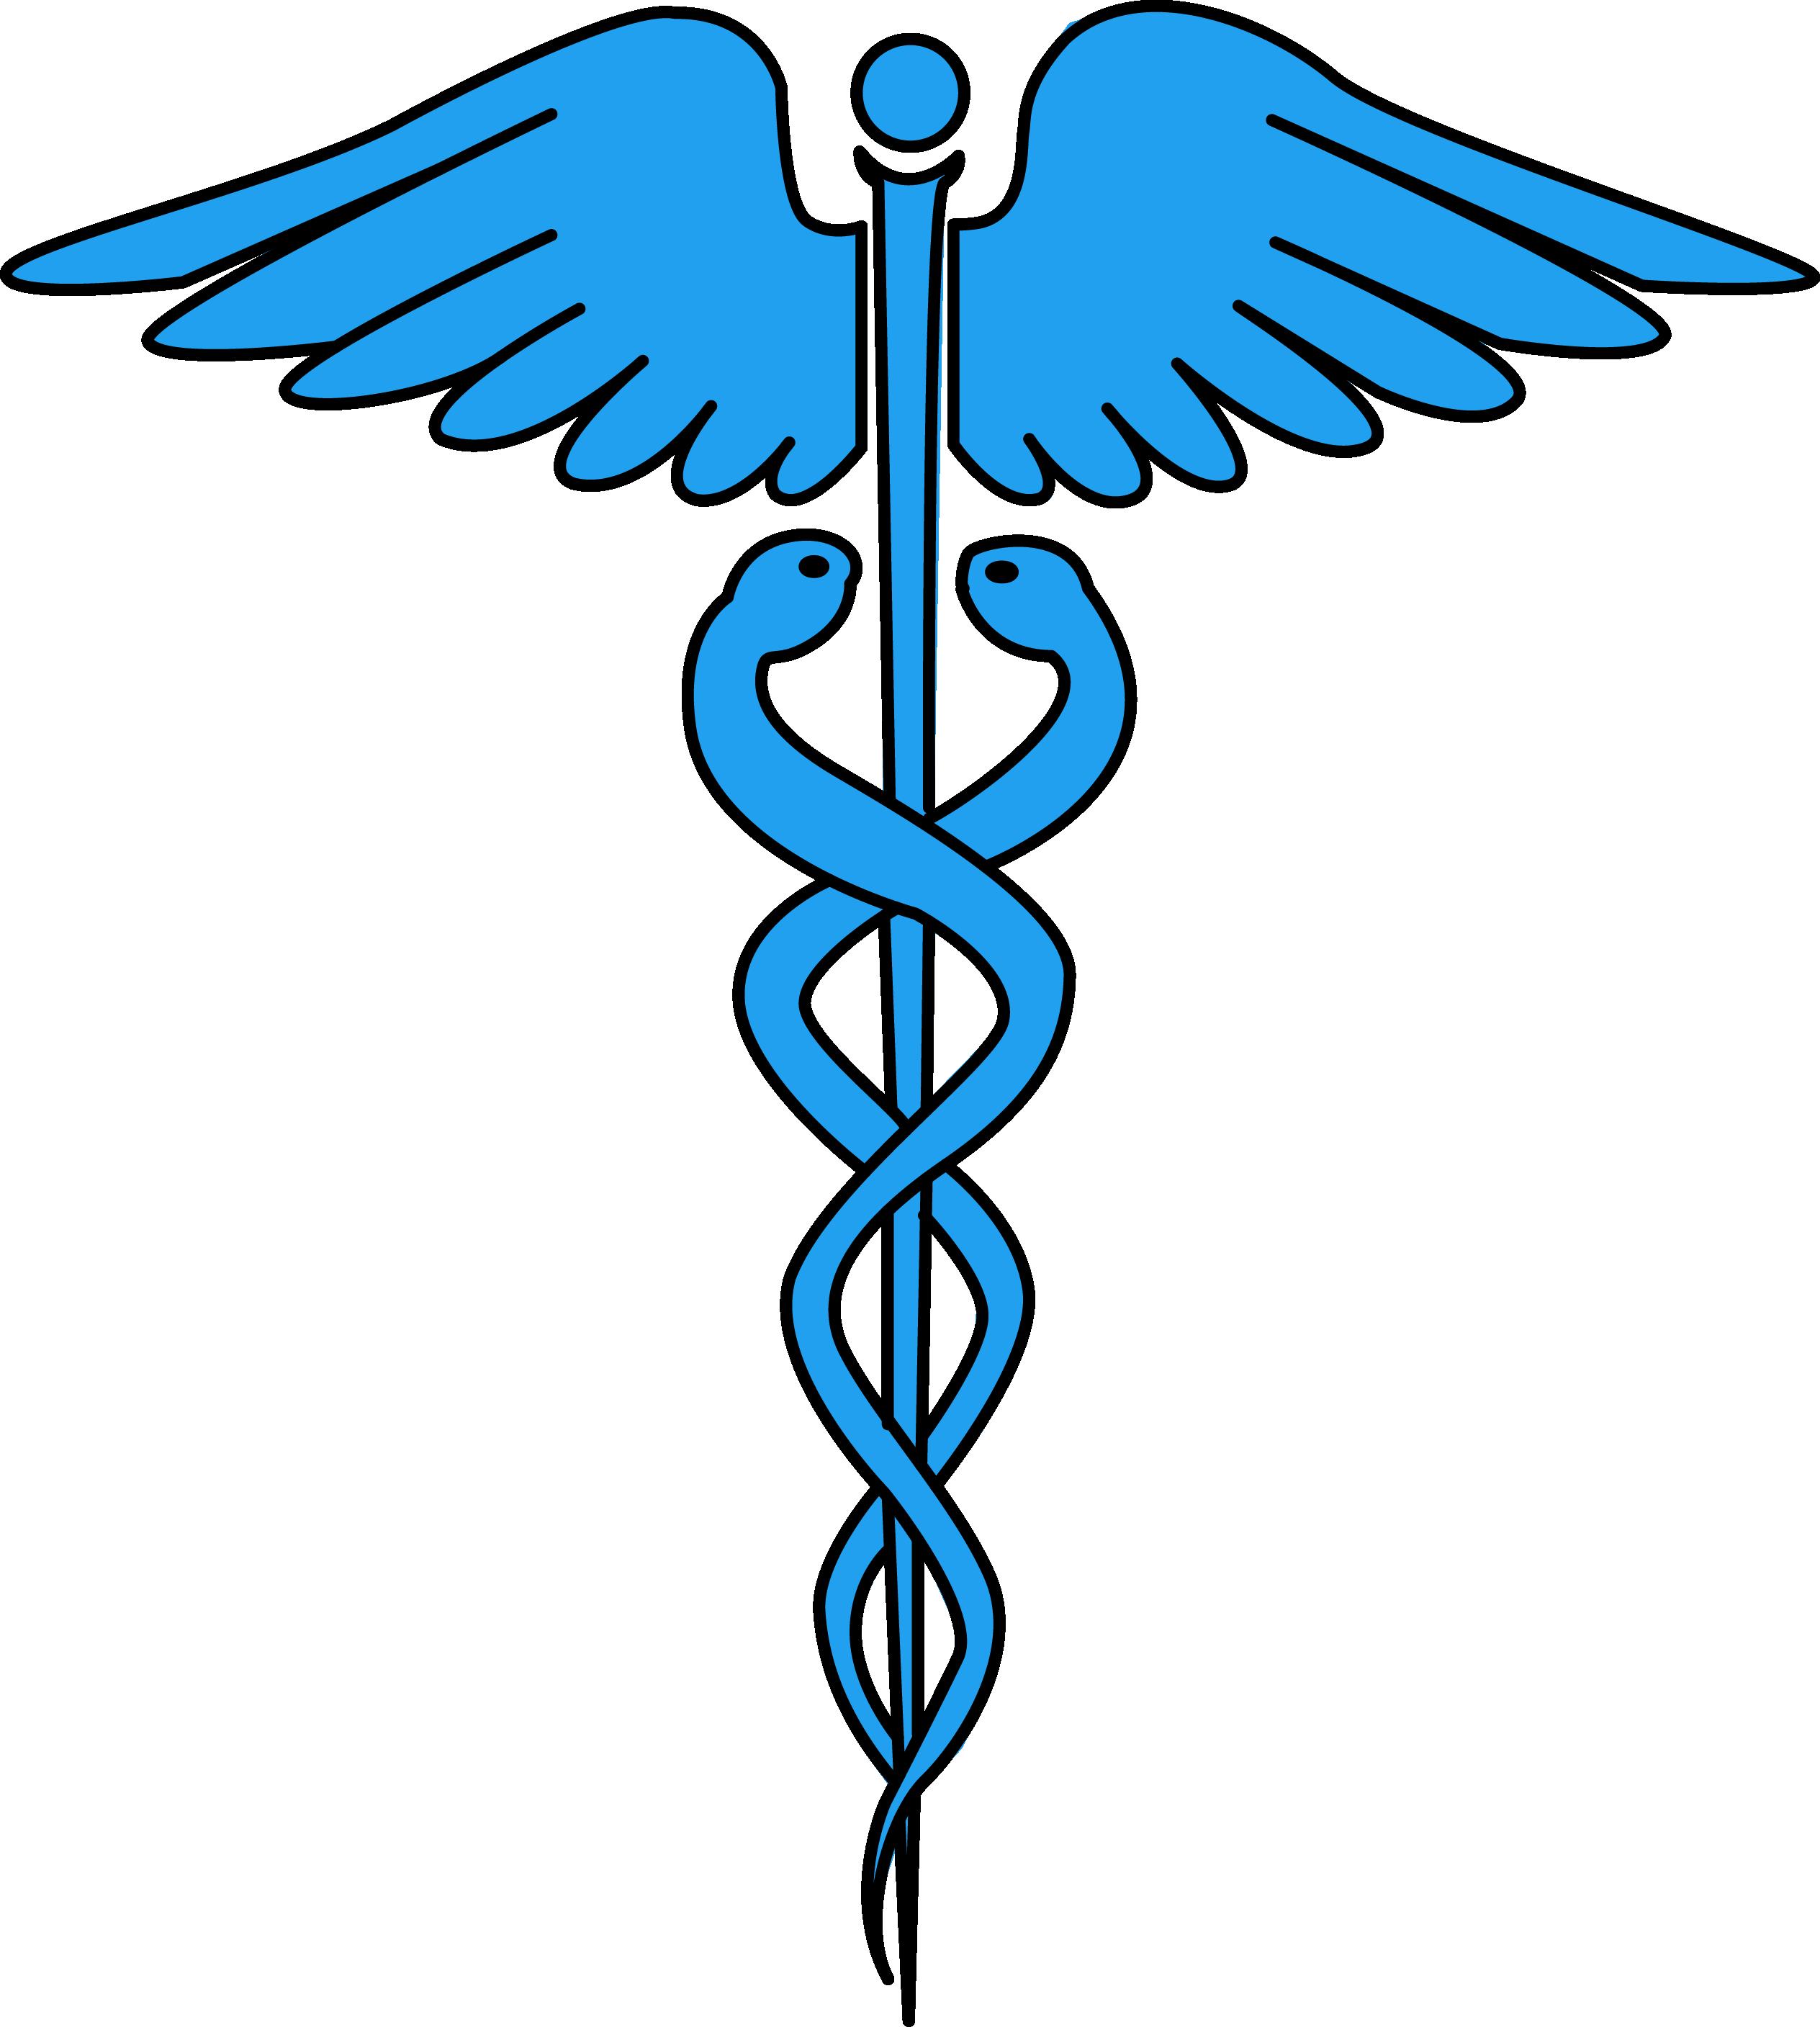 2528x2815 Image For Free Caduceus Medical Symbol Health High Resolution Clip